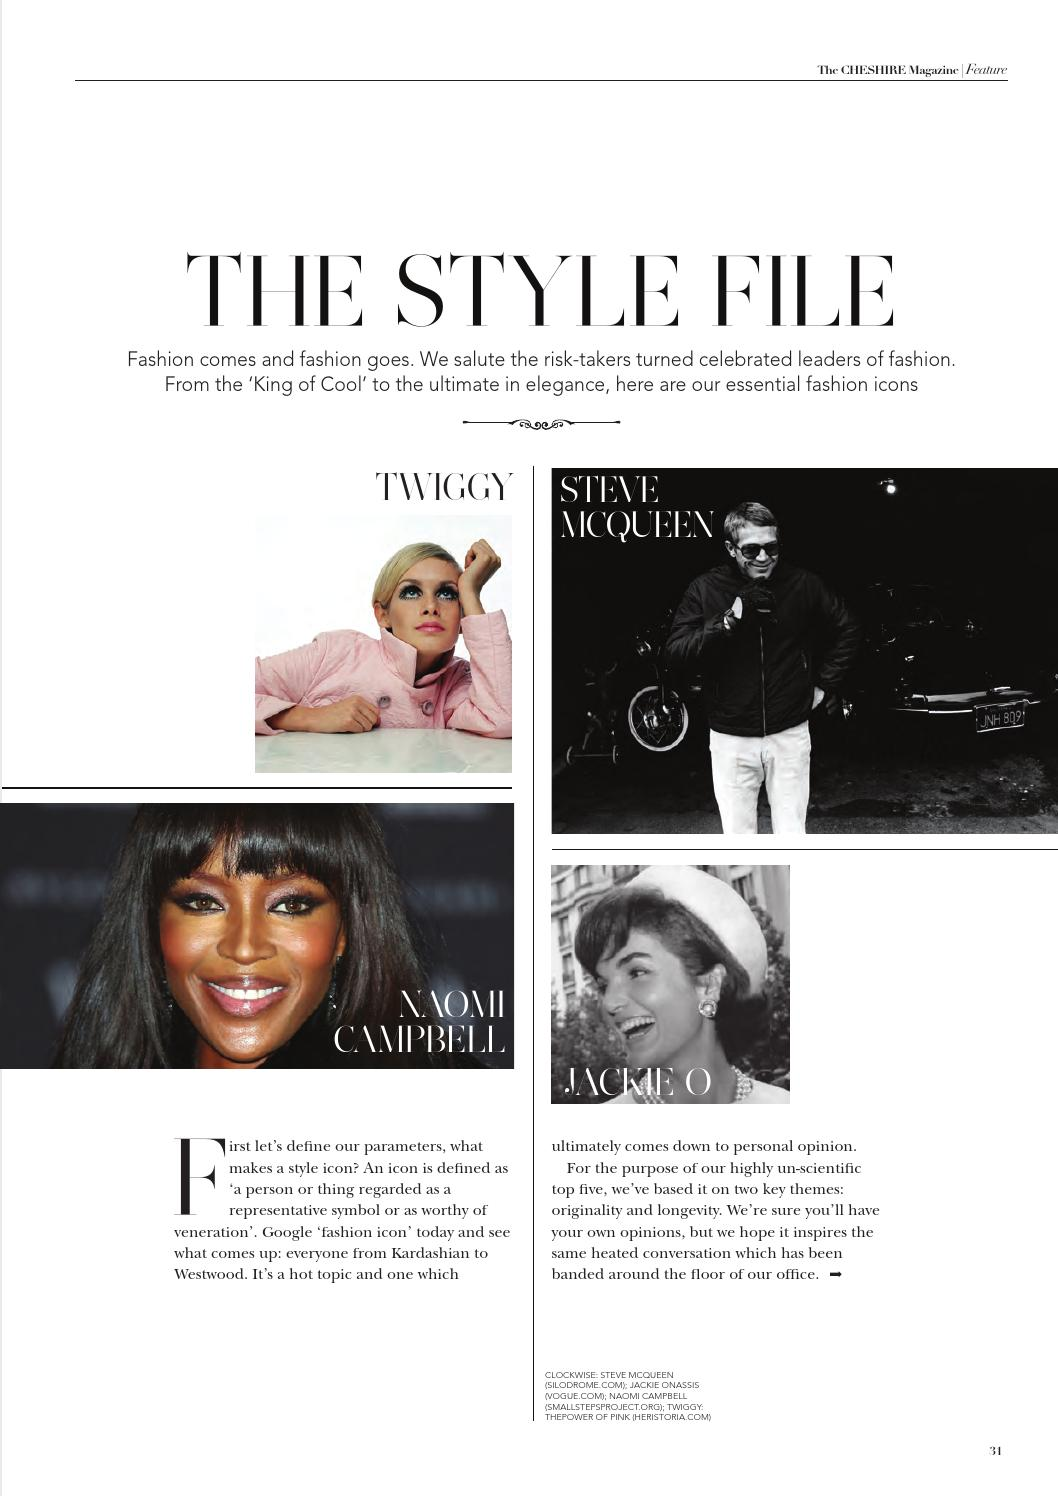 The Cheshire Magazine April 2016 by Runwild Media Group - issuu